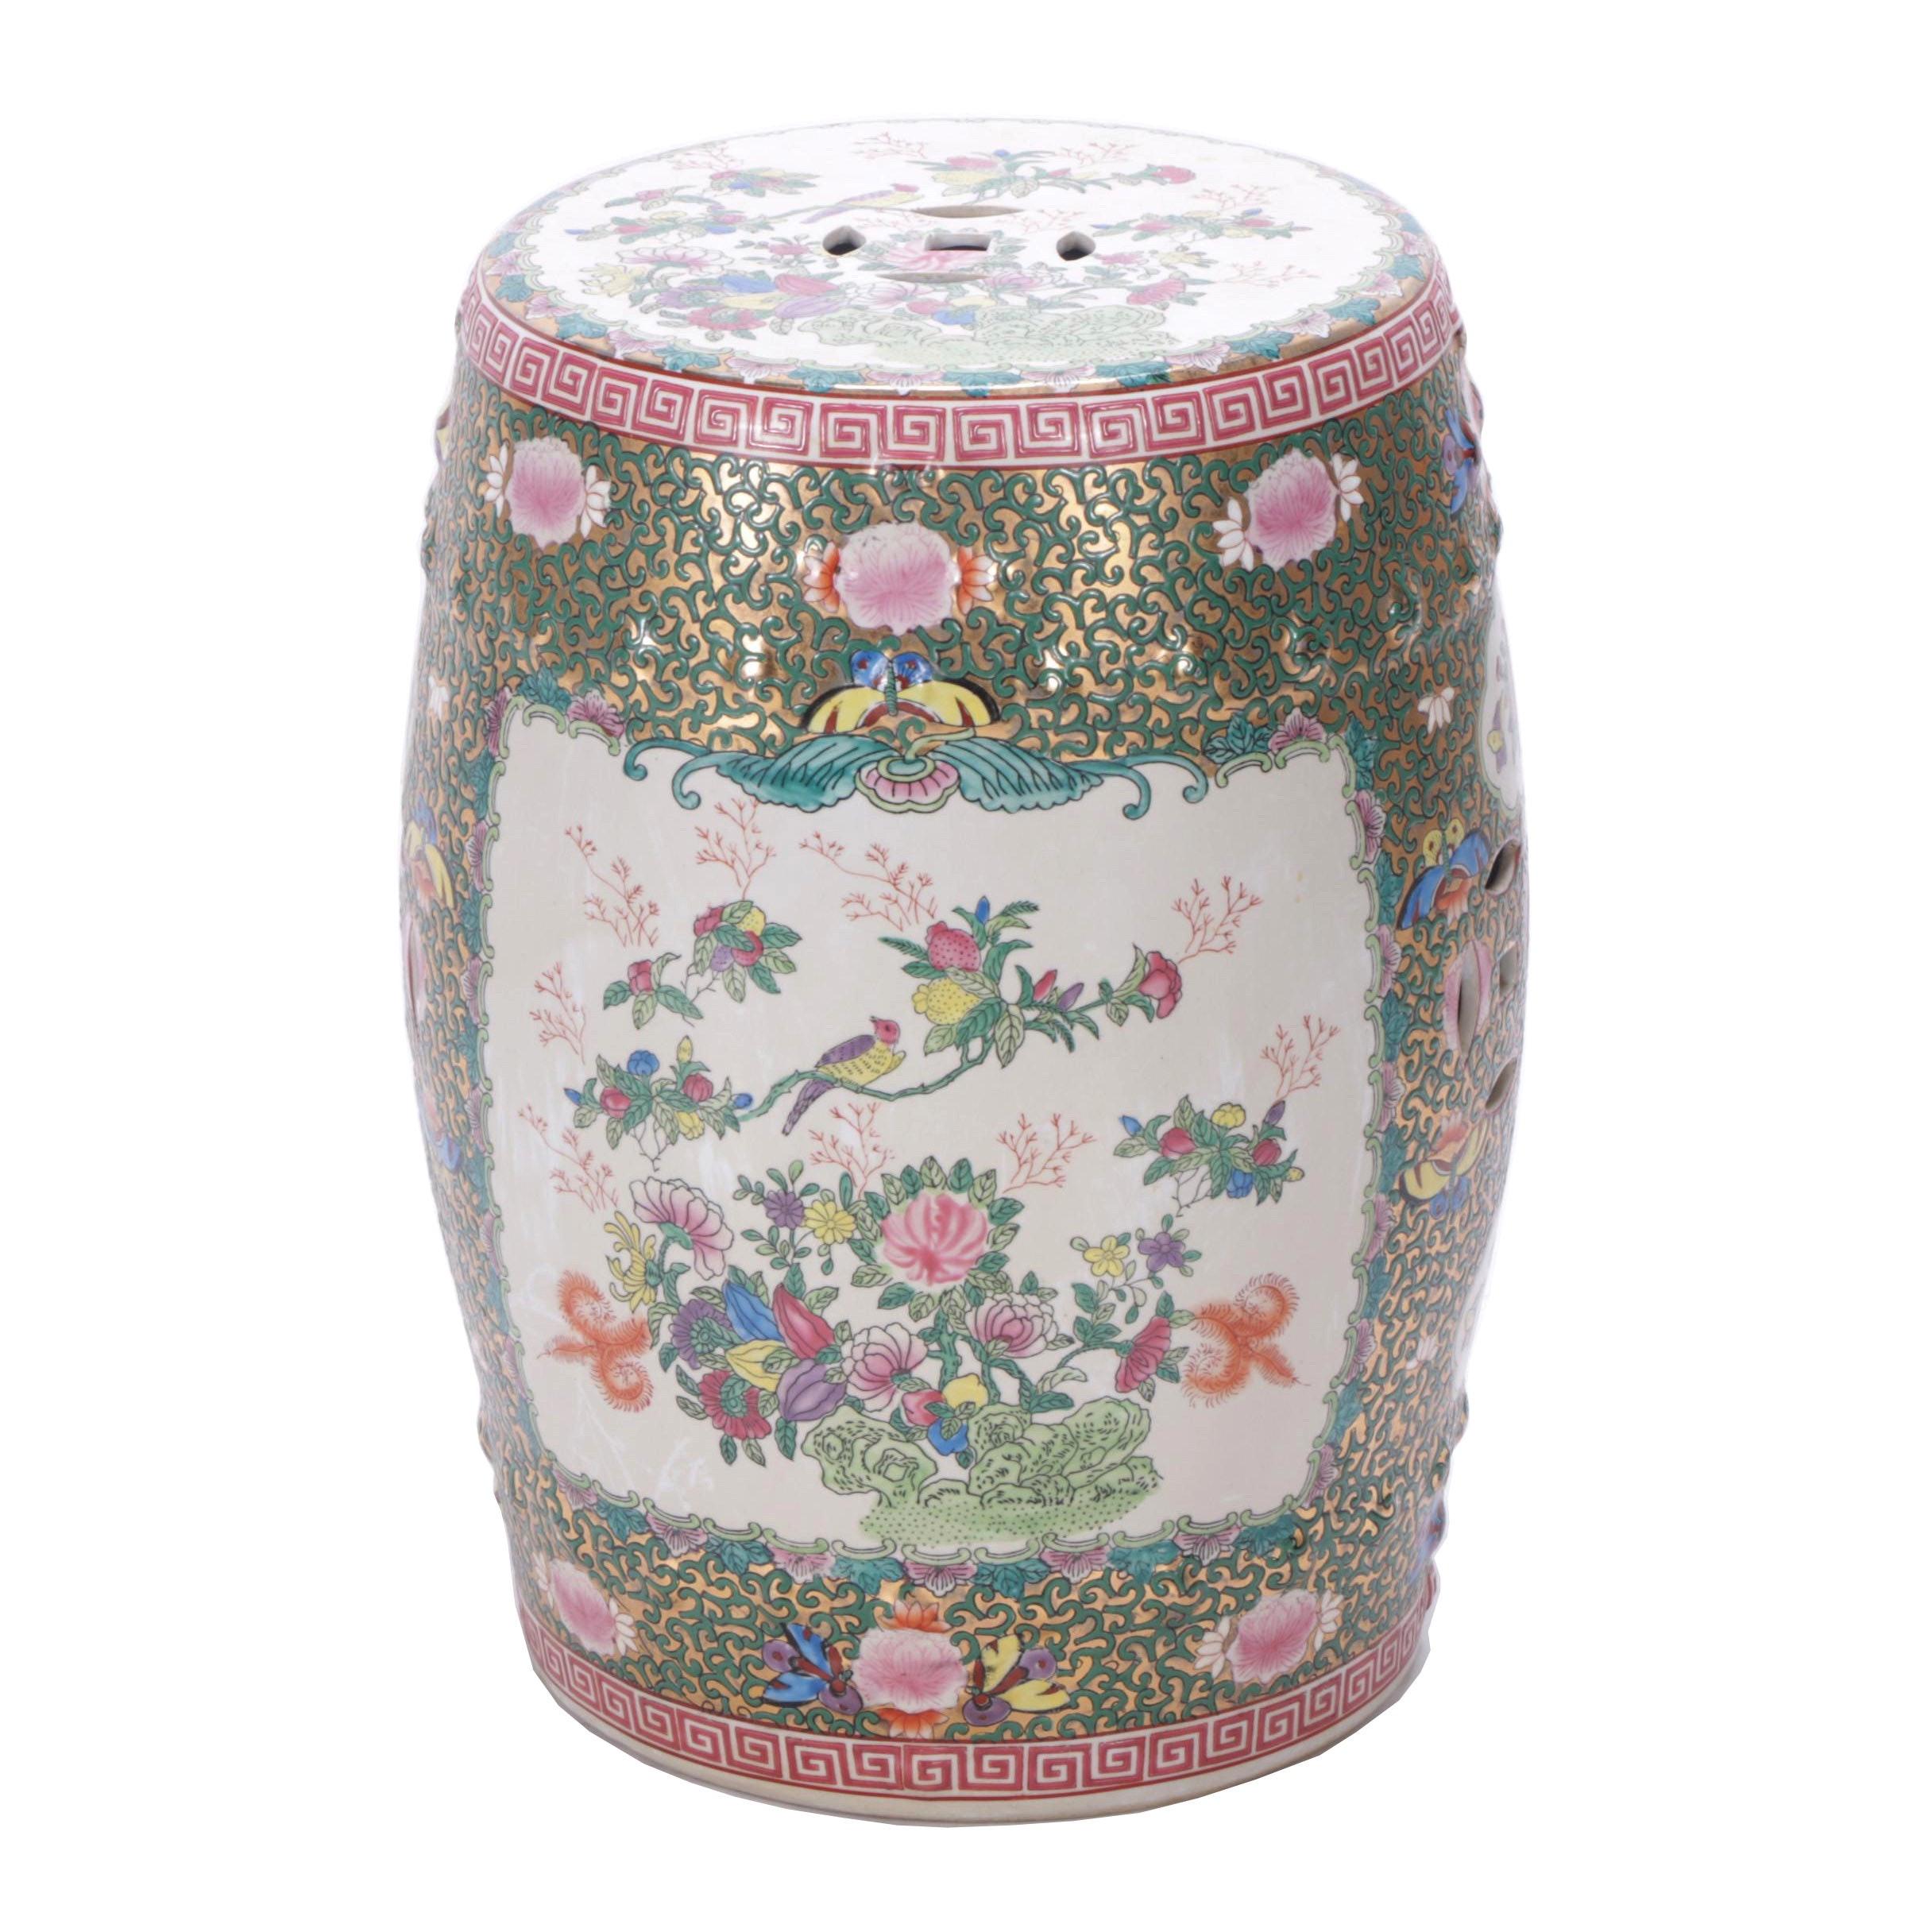 Chinese Floral Ceramic Garden Stool